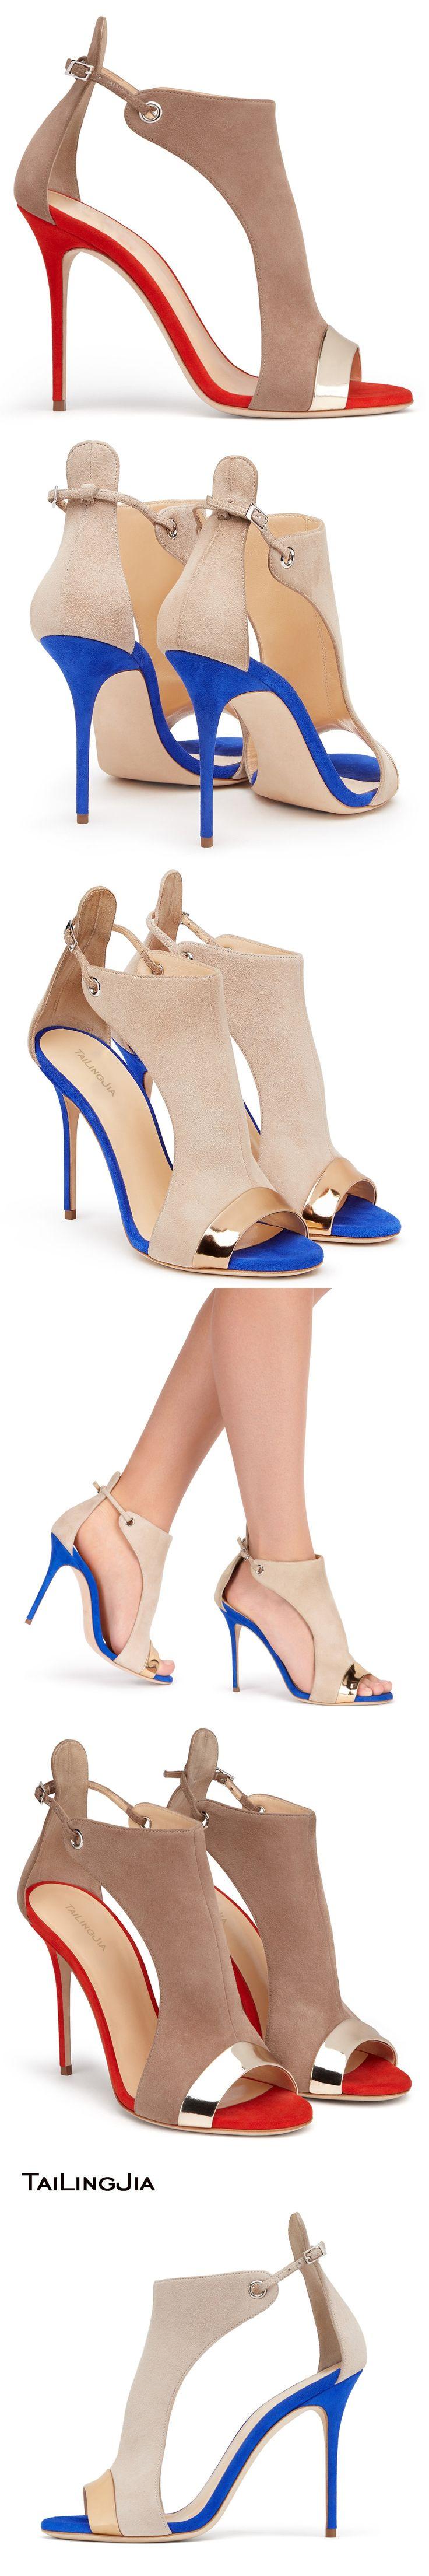 2017 Faux Leather Flock Cover Heel Women Sandals Mixed Color Peep Toe Shoes Large Size Ladies Shoes US4-15.5